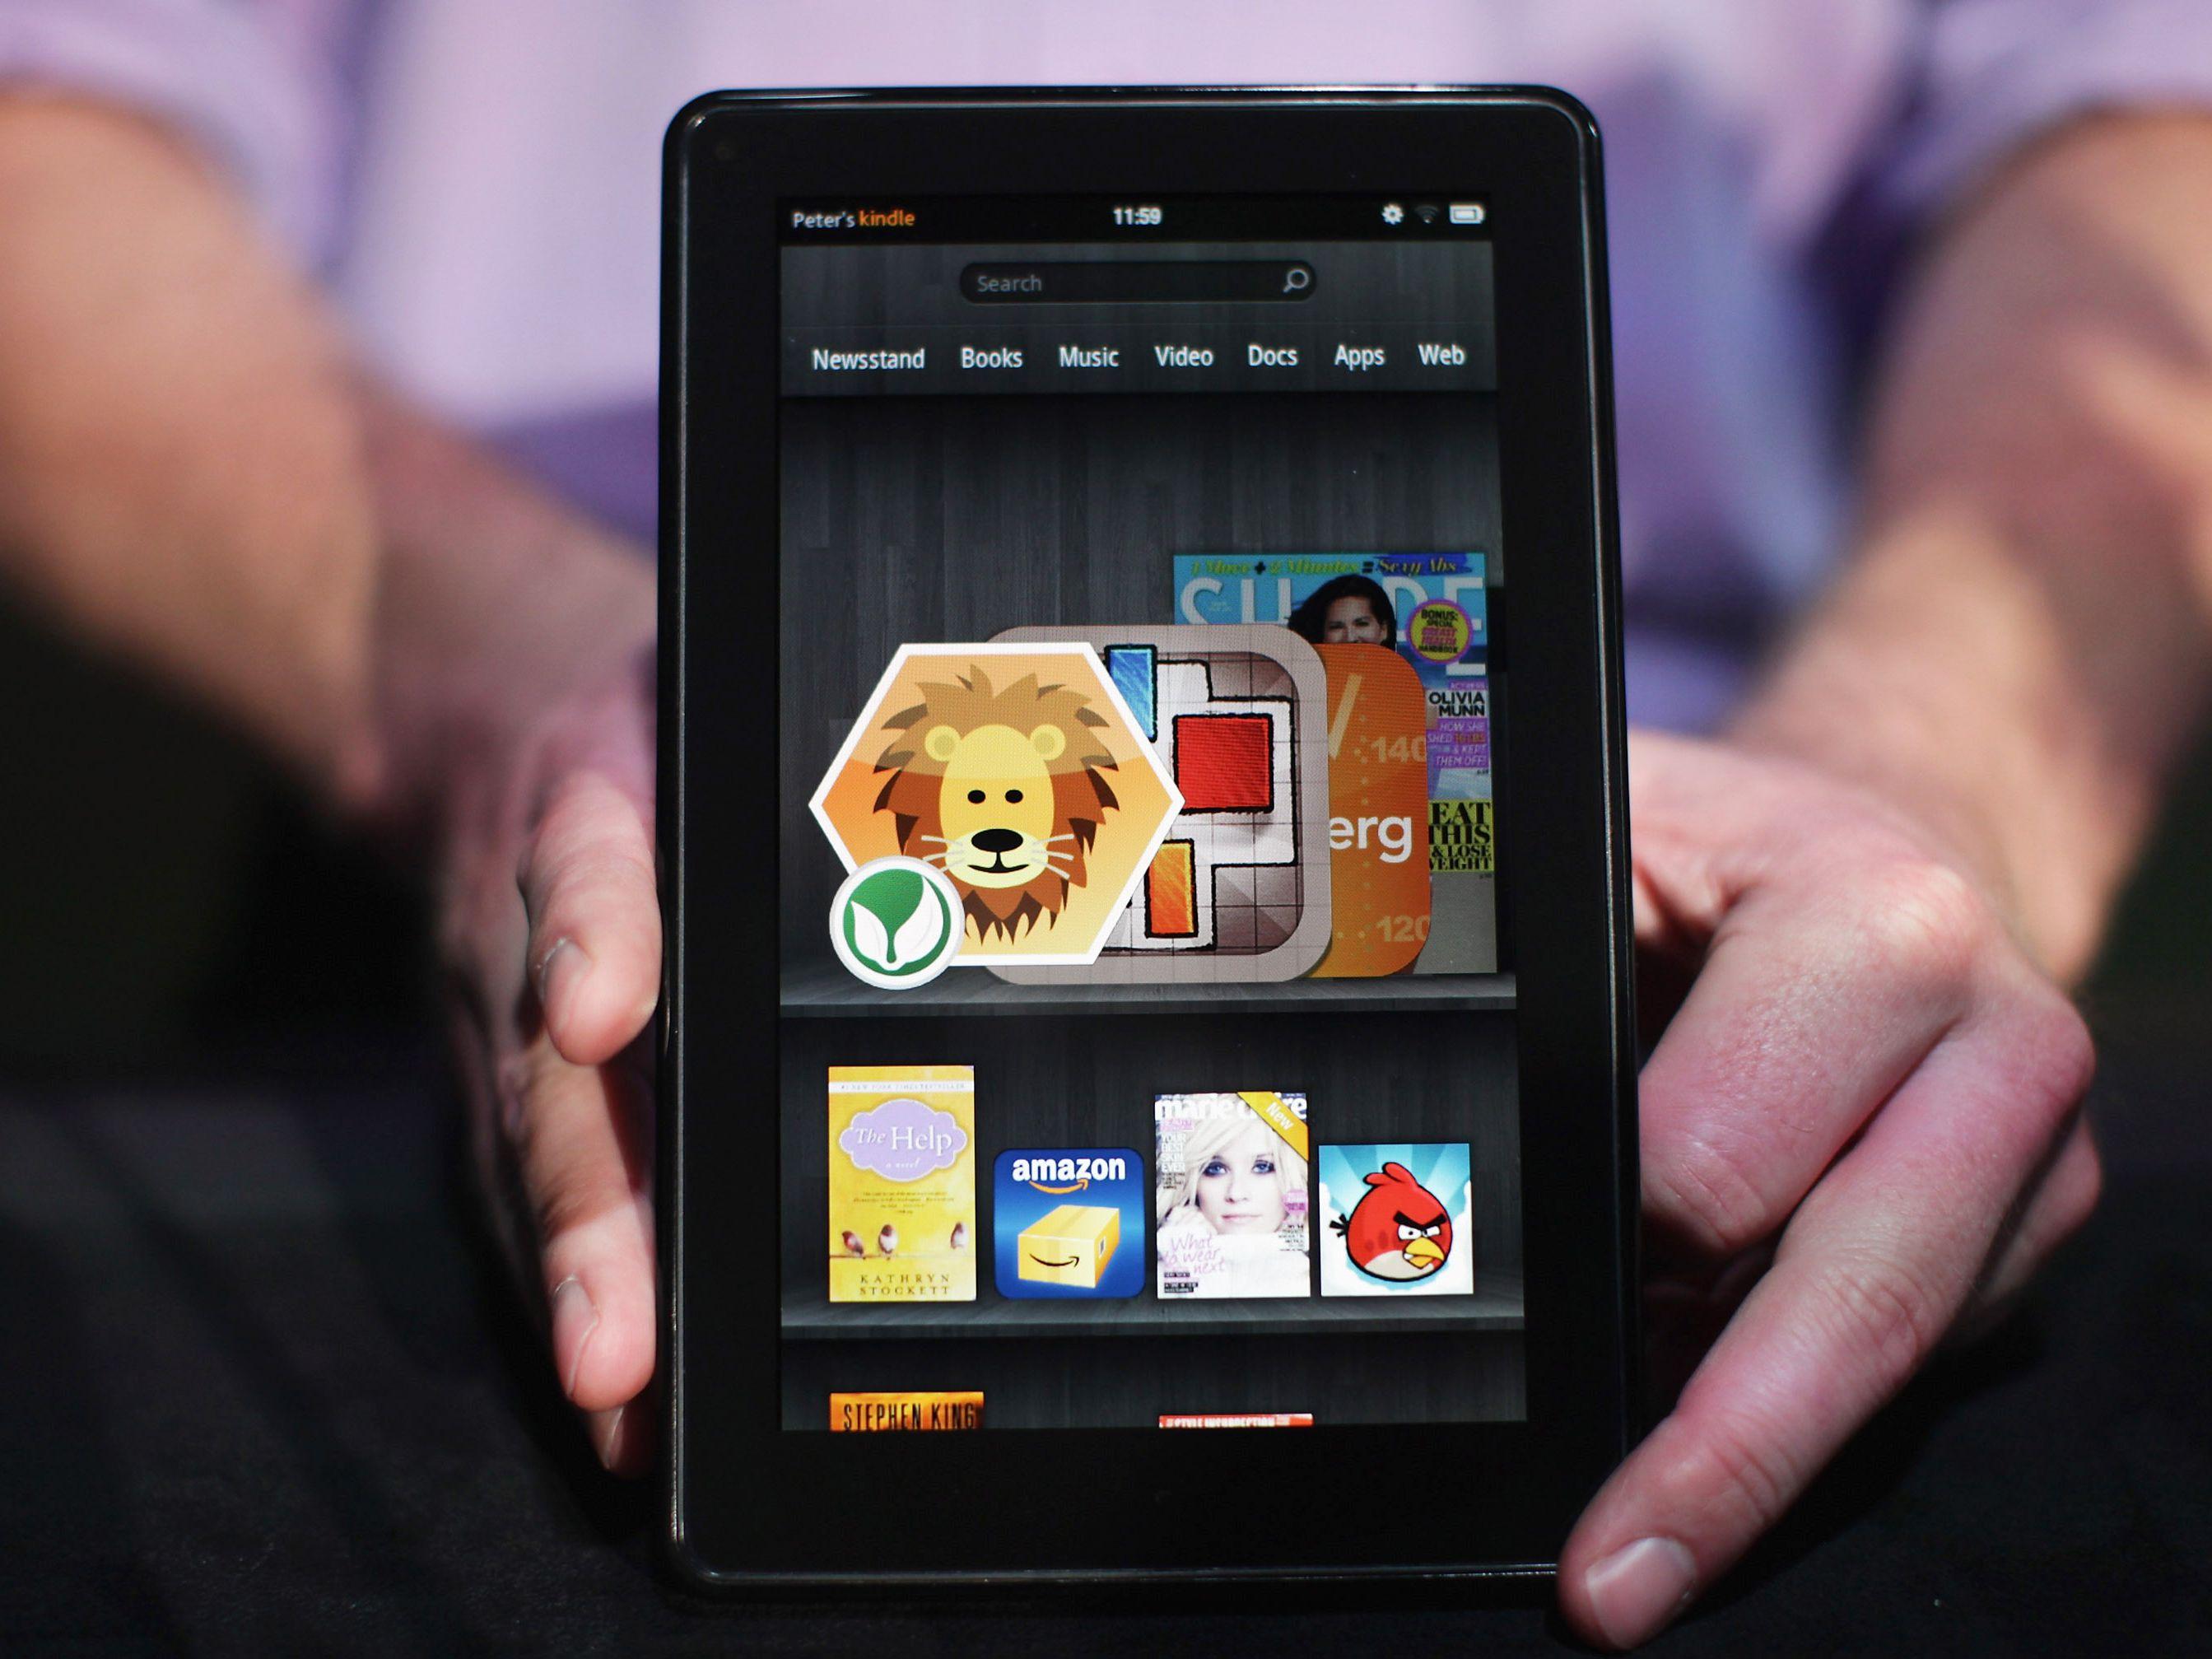 The Amazon Kindle Fire vs the Apple iPad 2